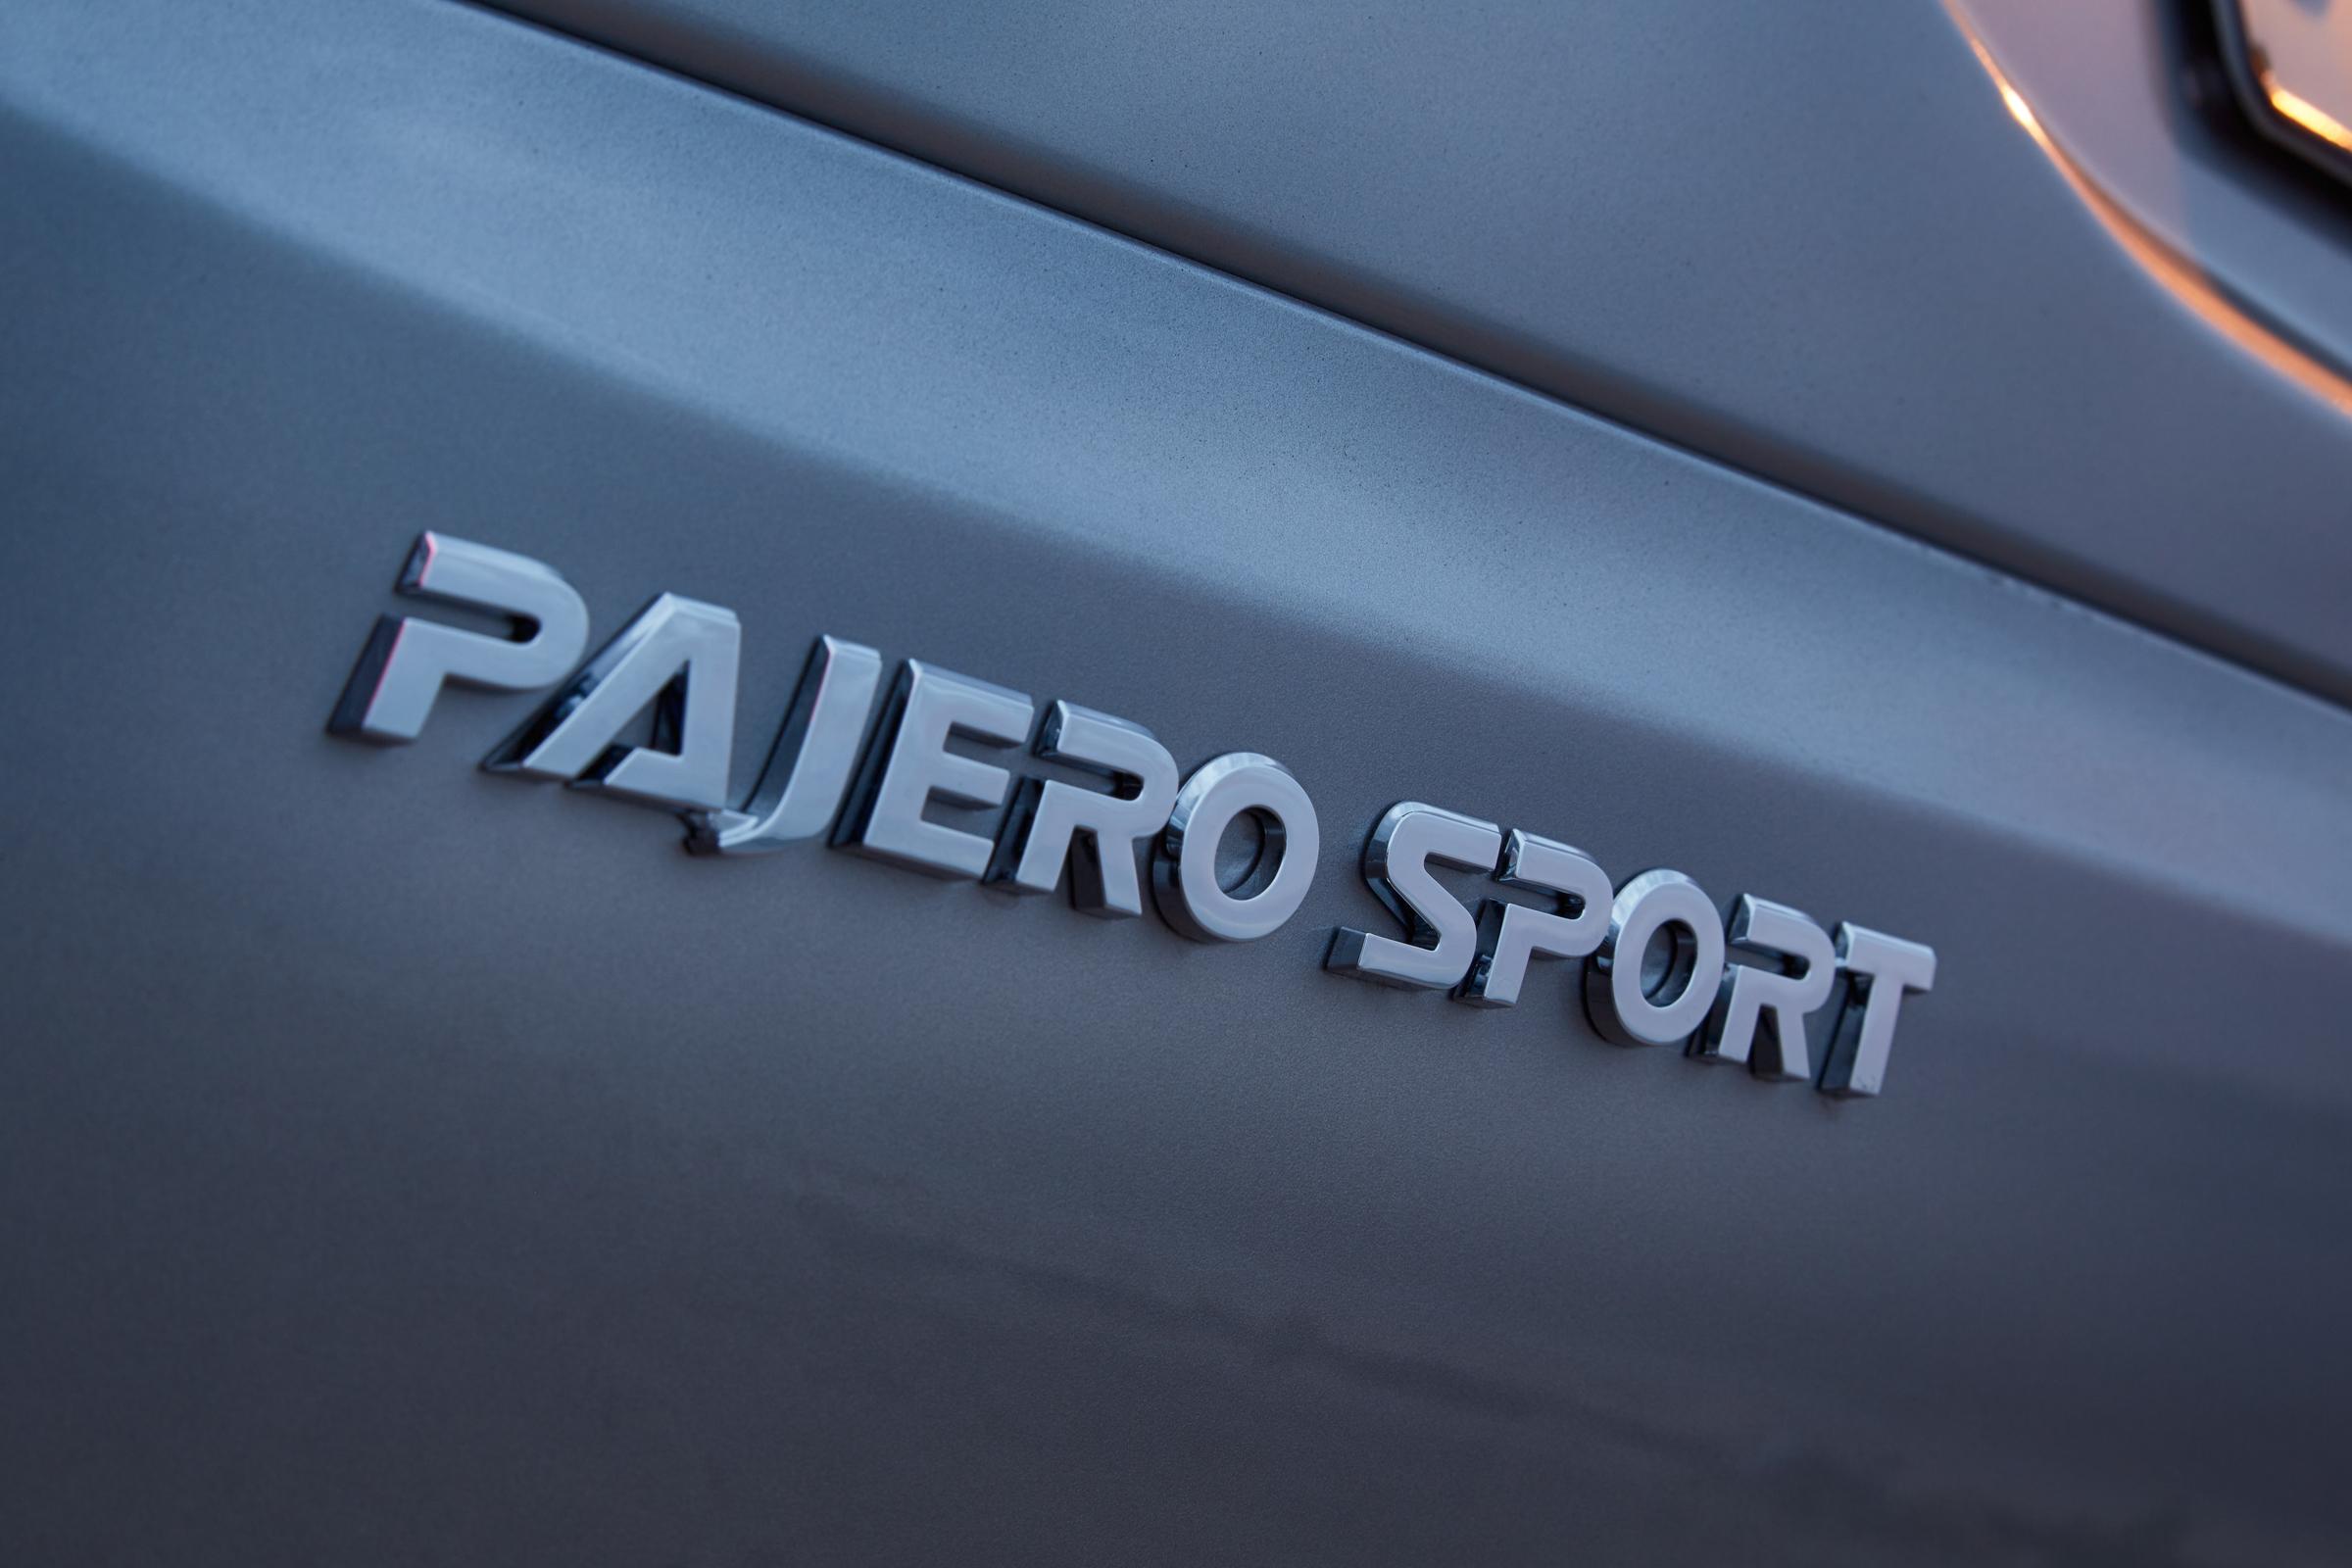 2016 Mitsubishi Pajero Sport Review - Photos